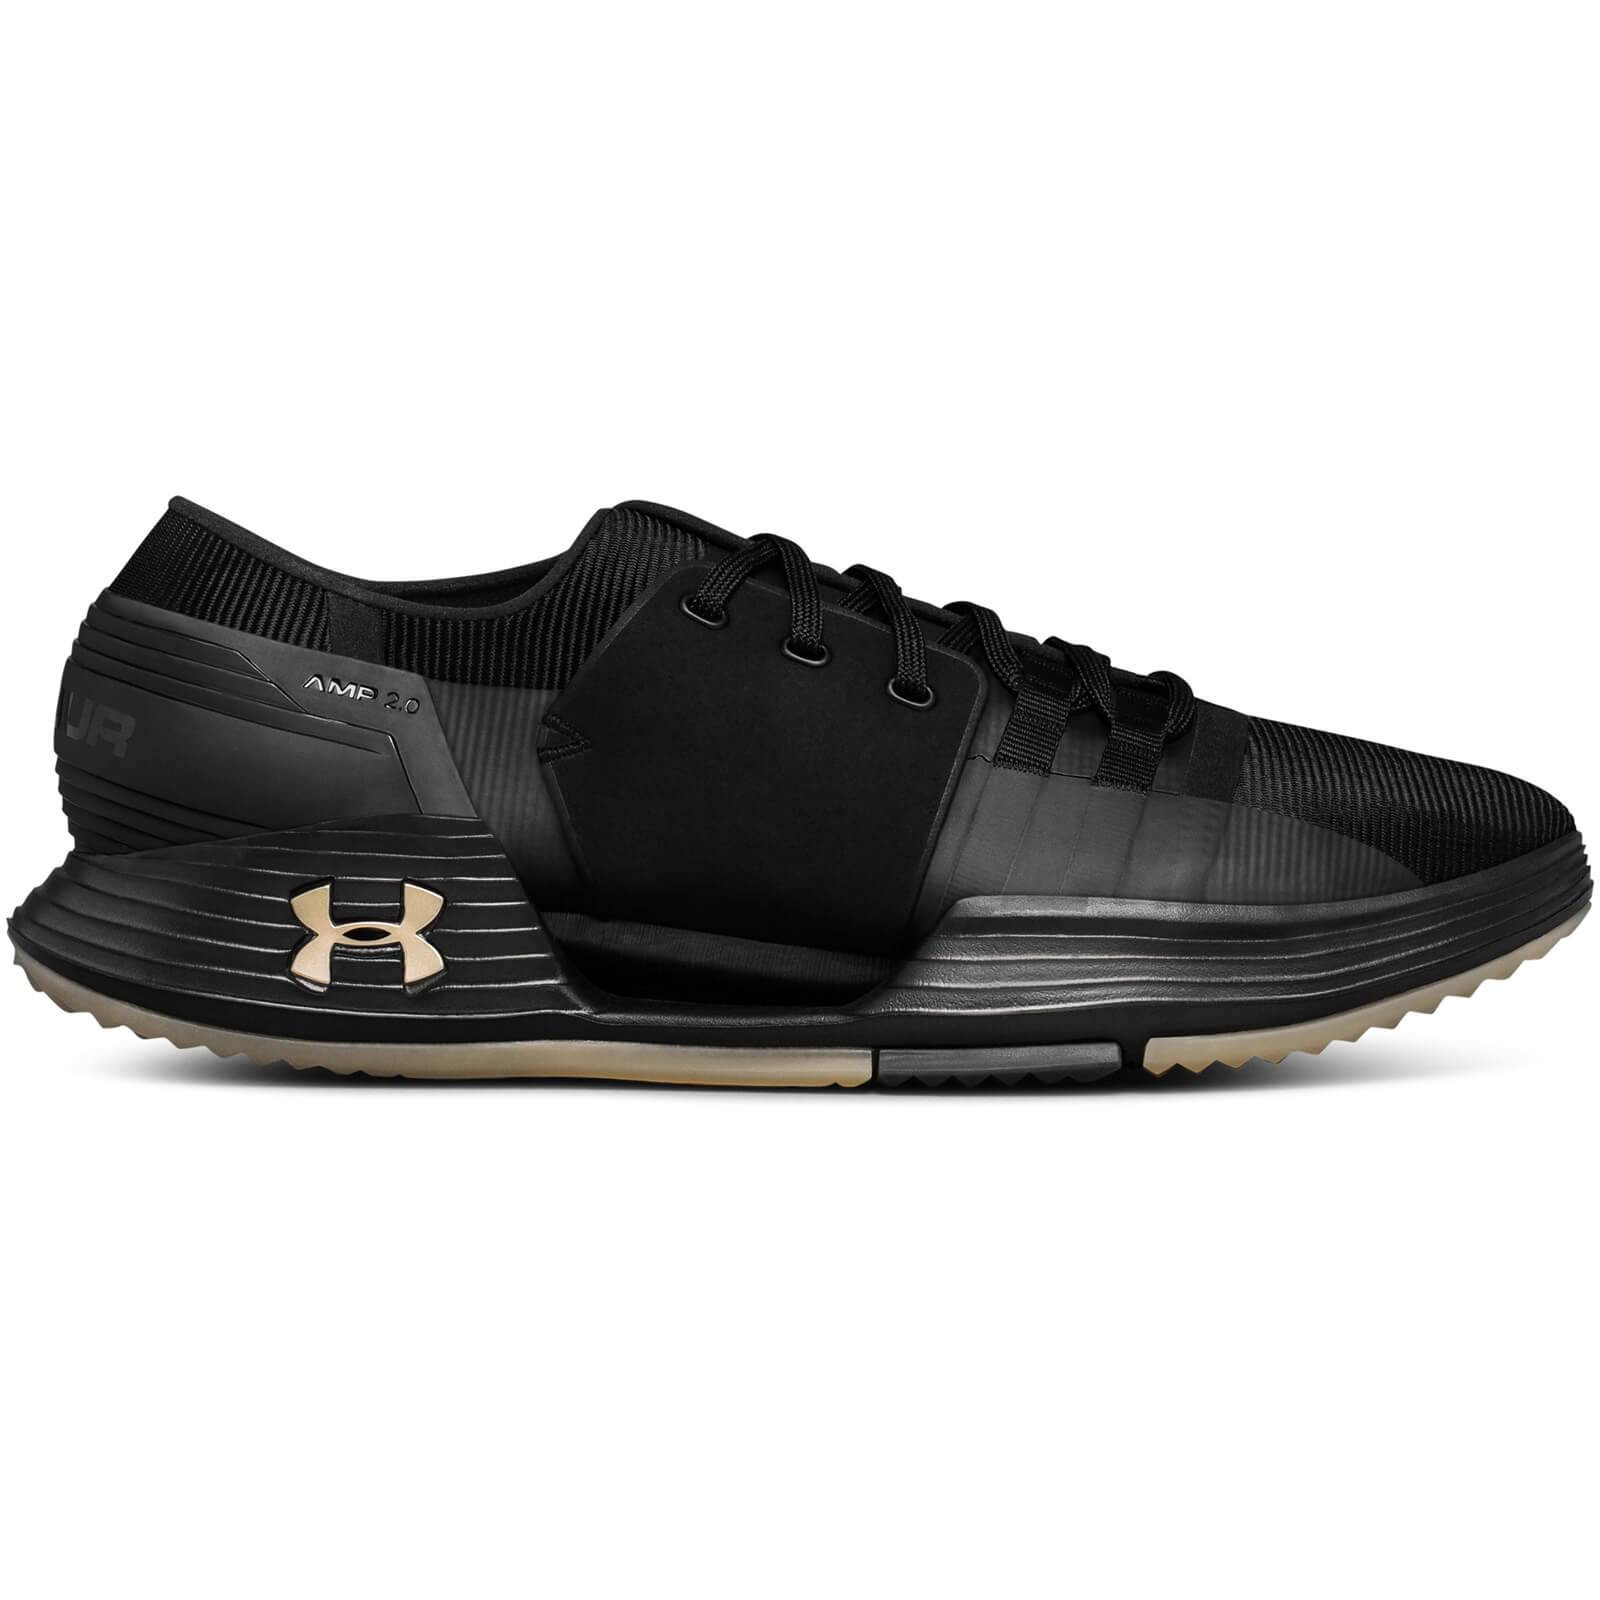 Under Armour Men's Speedform AMP 2.0 Training Shoes - Black/Yellow - US 11/UK 10 - Black/Yellow